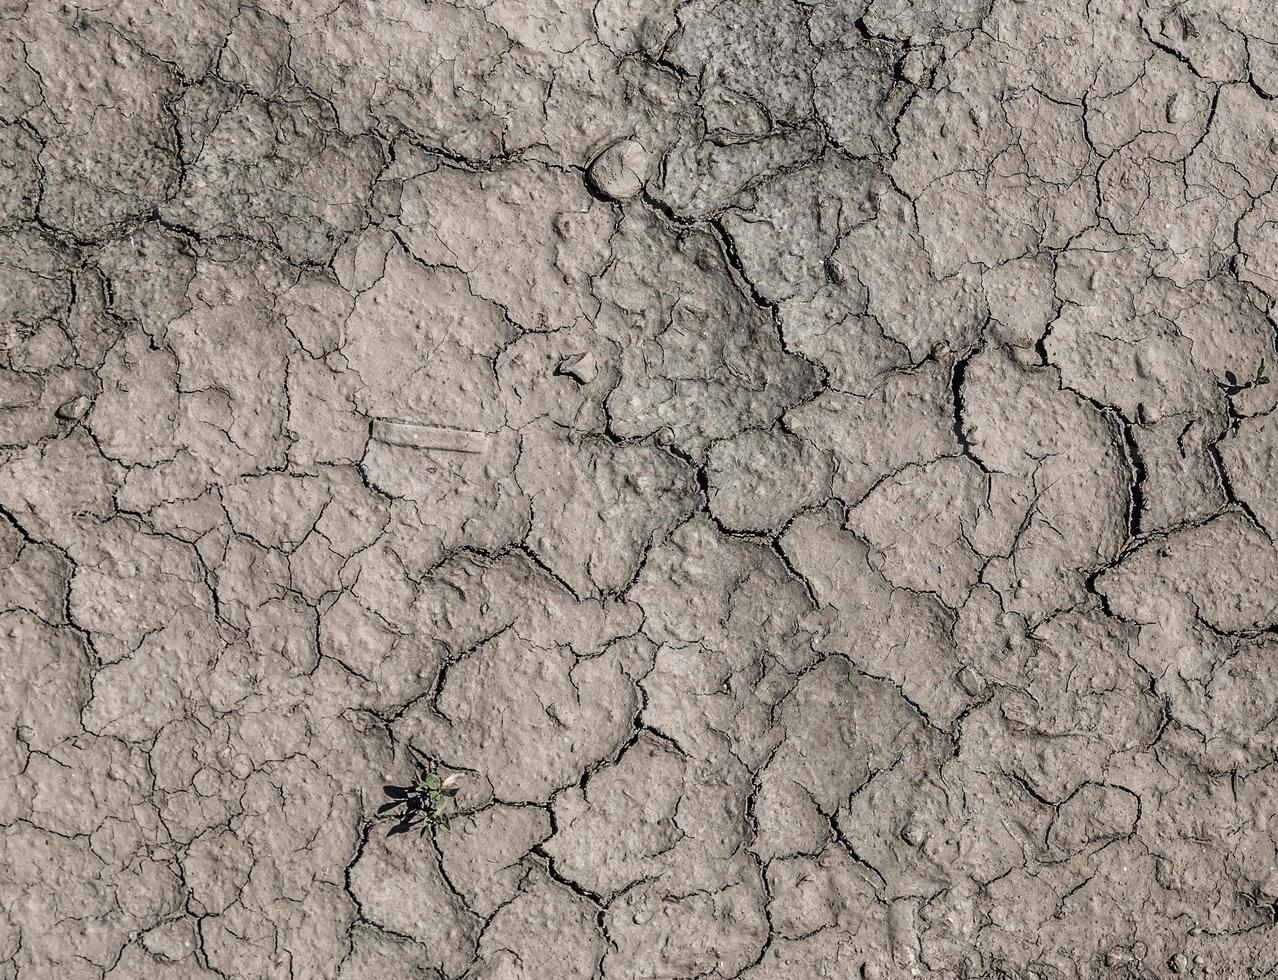 Textur Dürre ausgetrocknete Erde foto